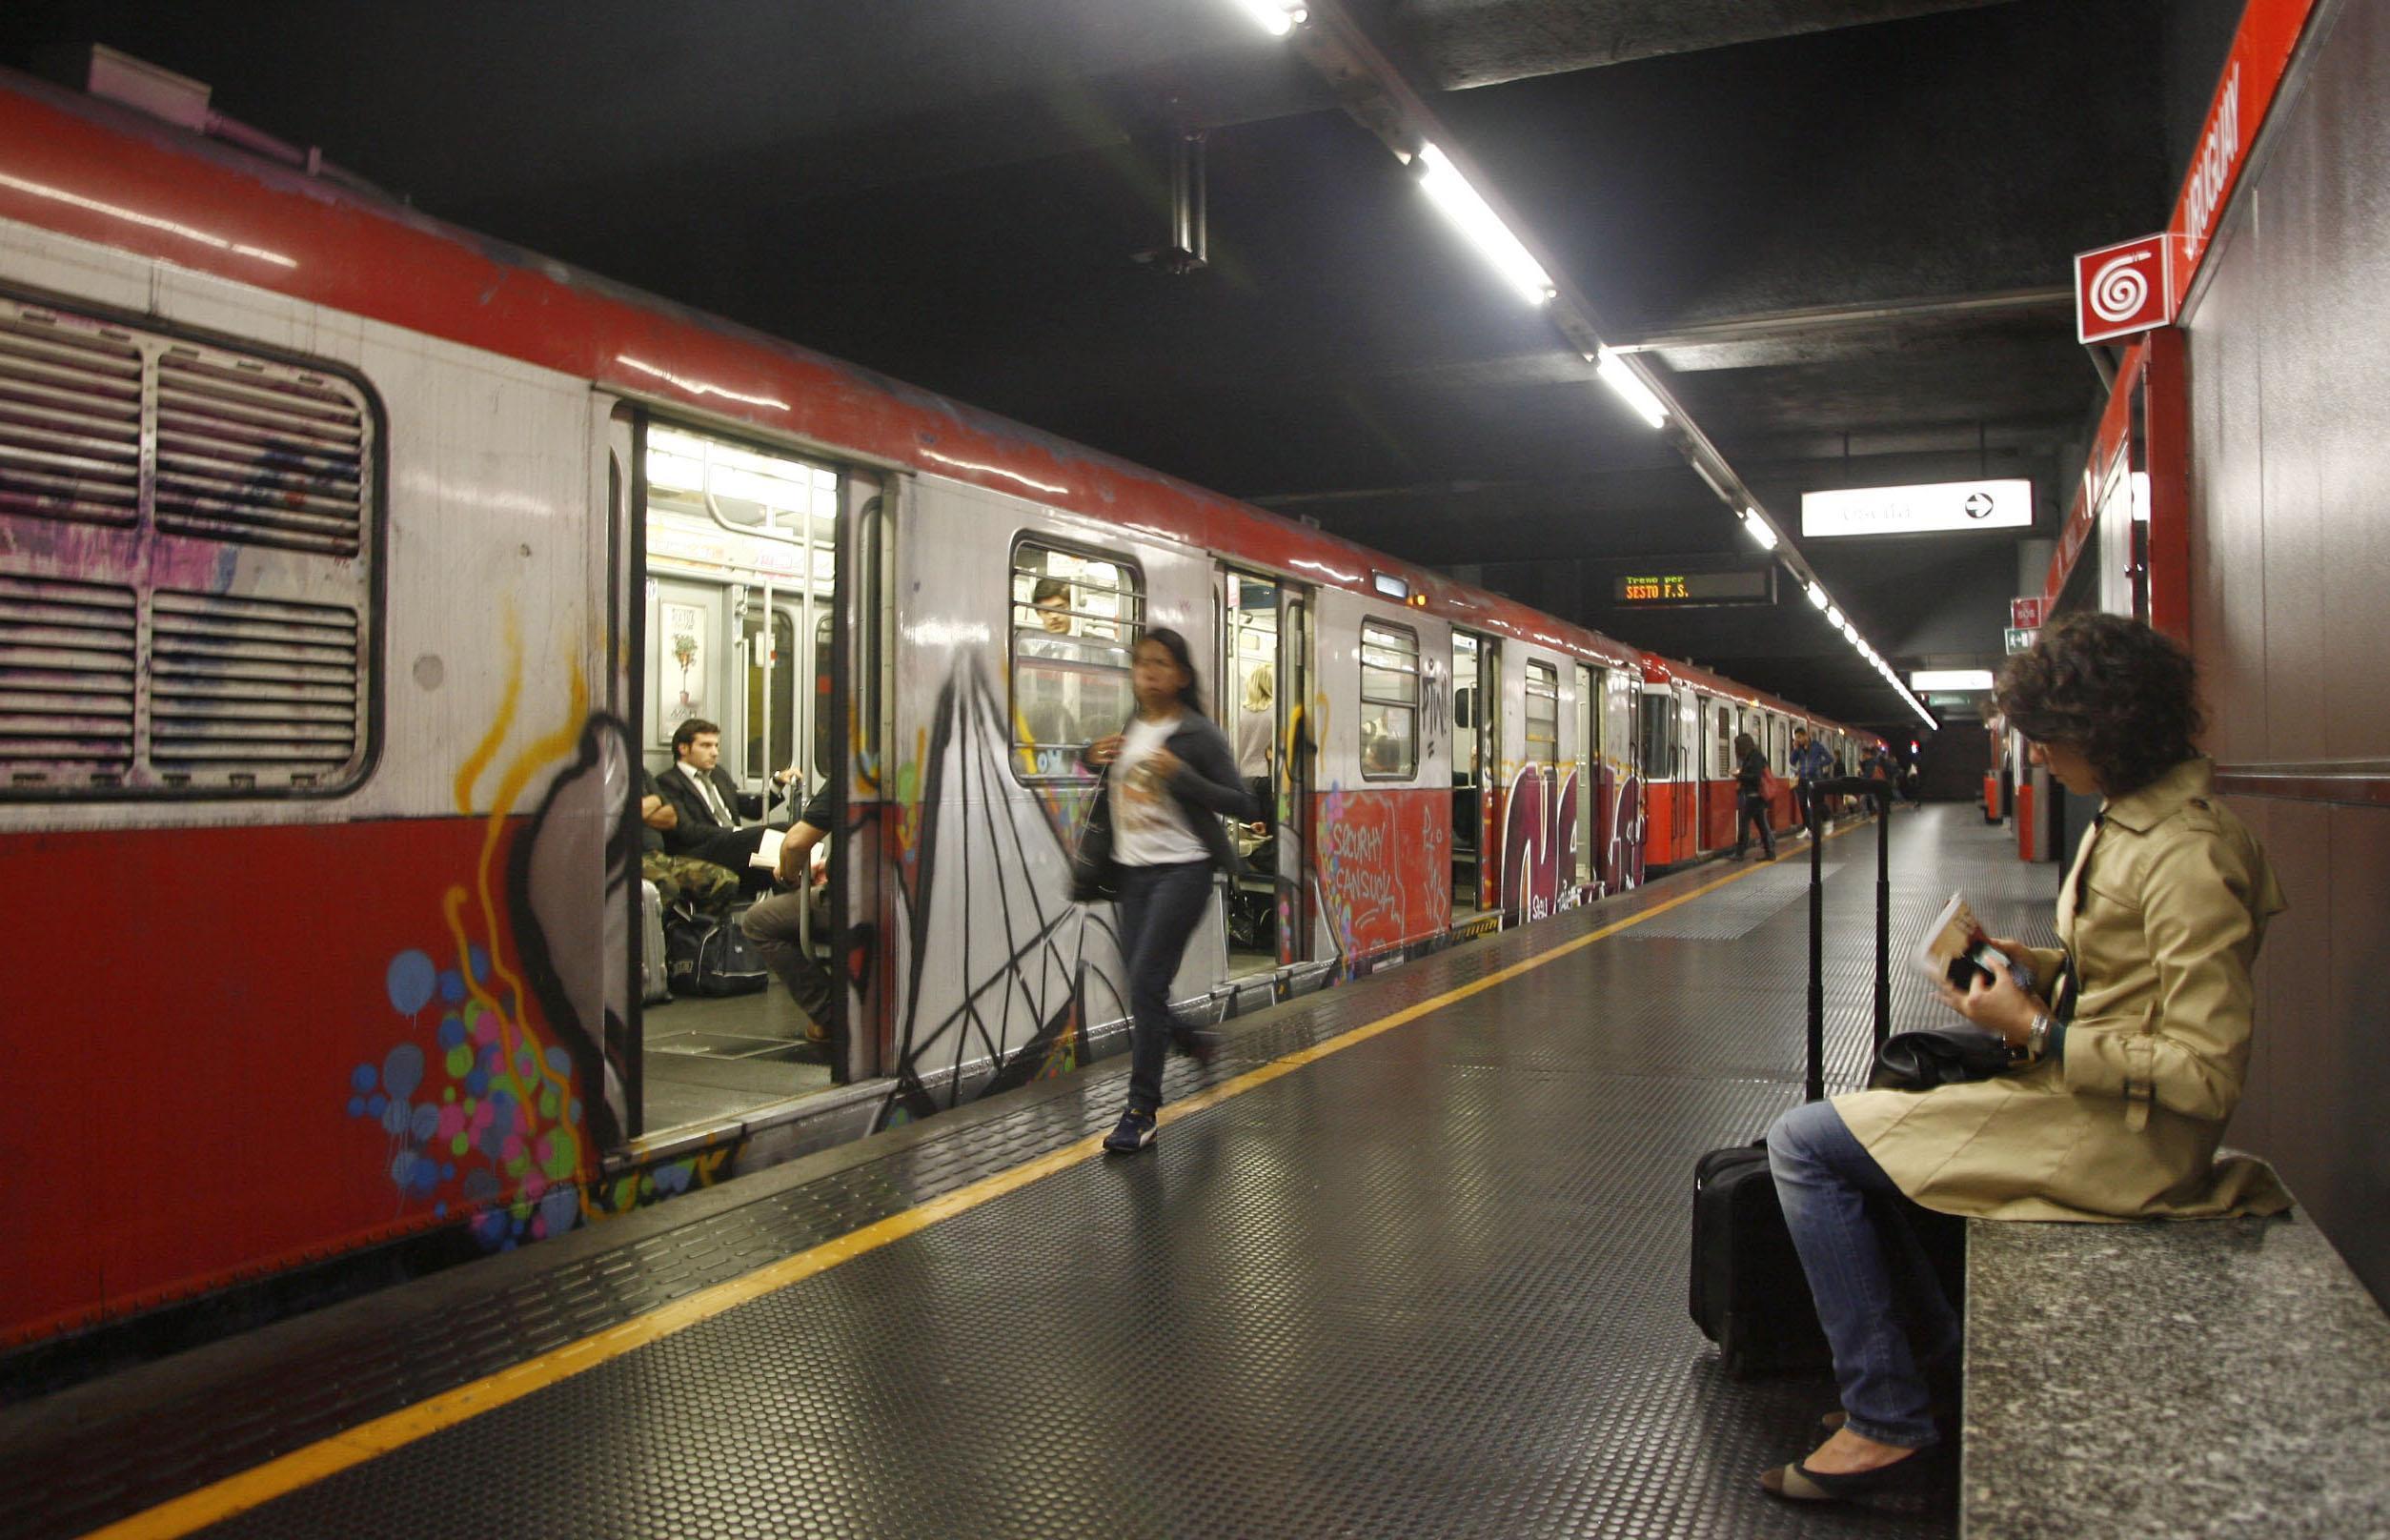 Milano, incidente in metro: linea sospesa e paura fra i pendolari